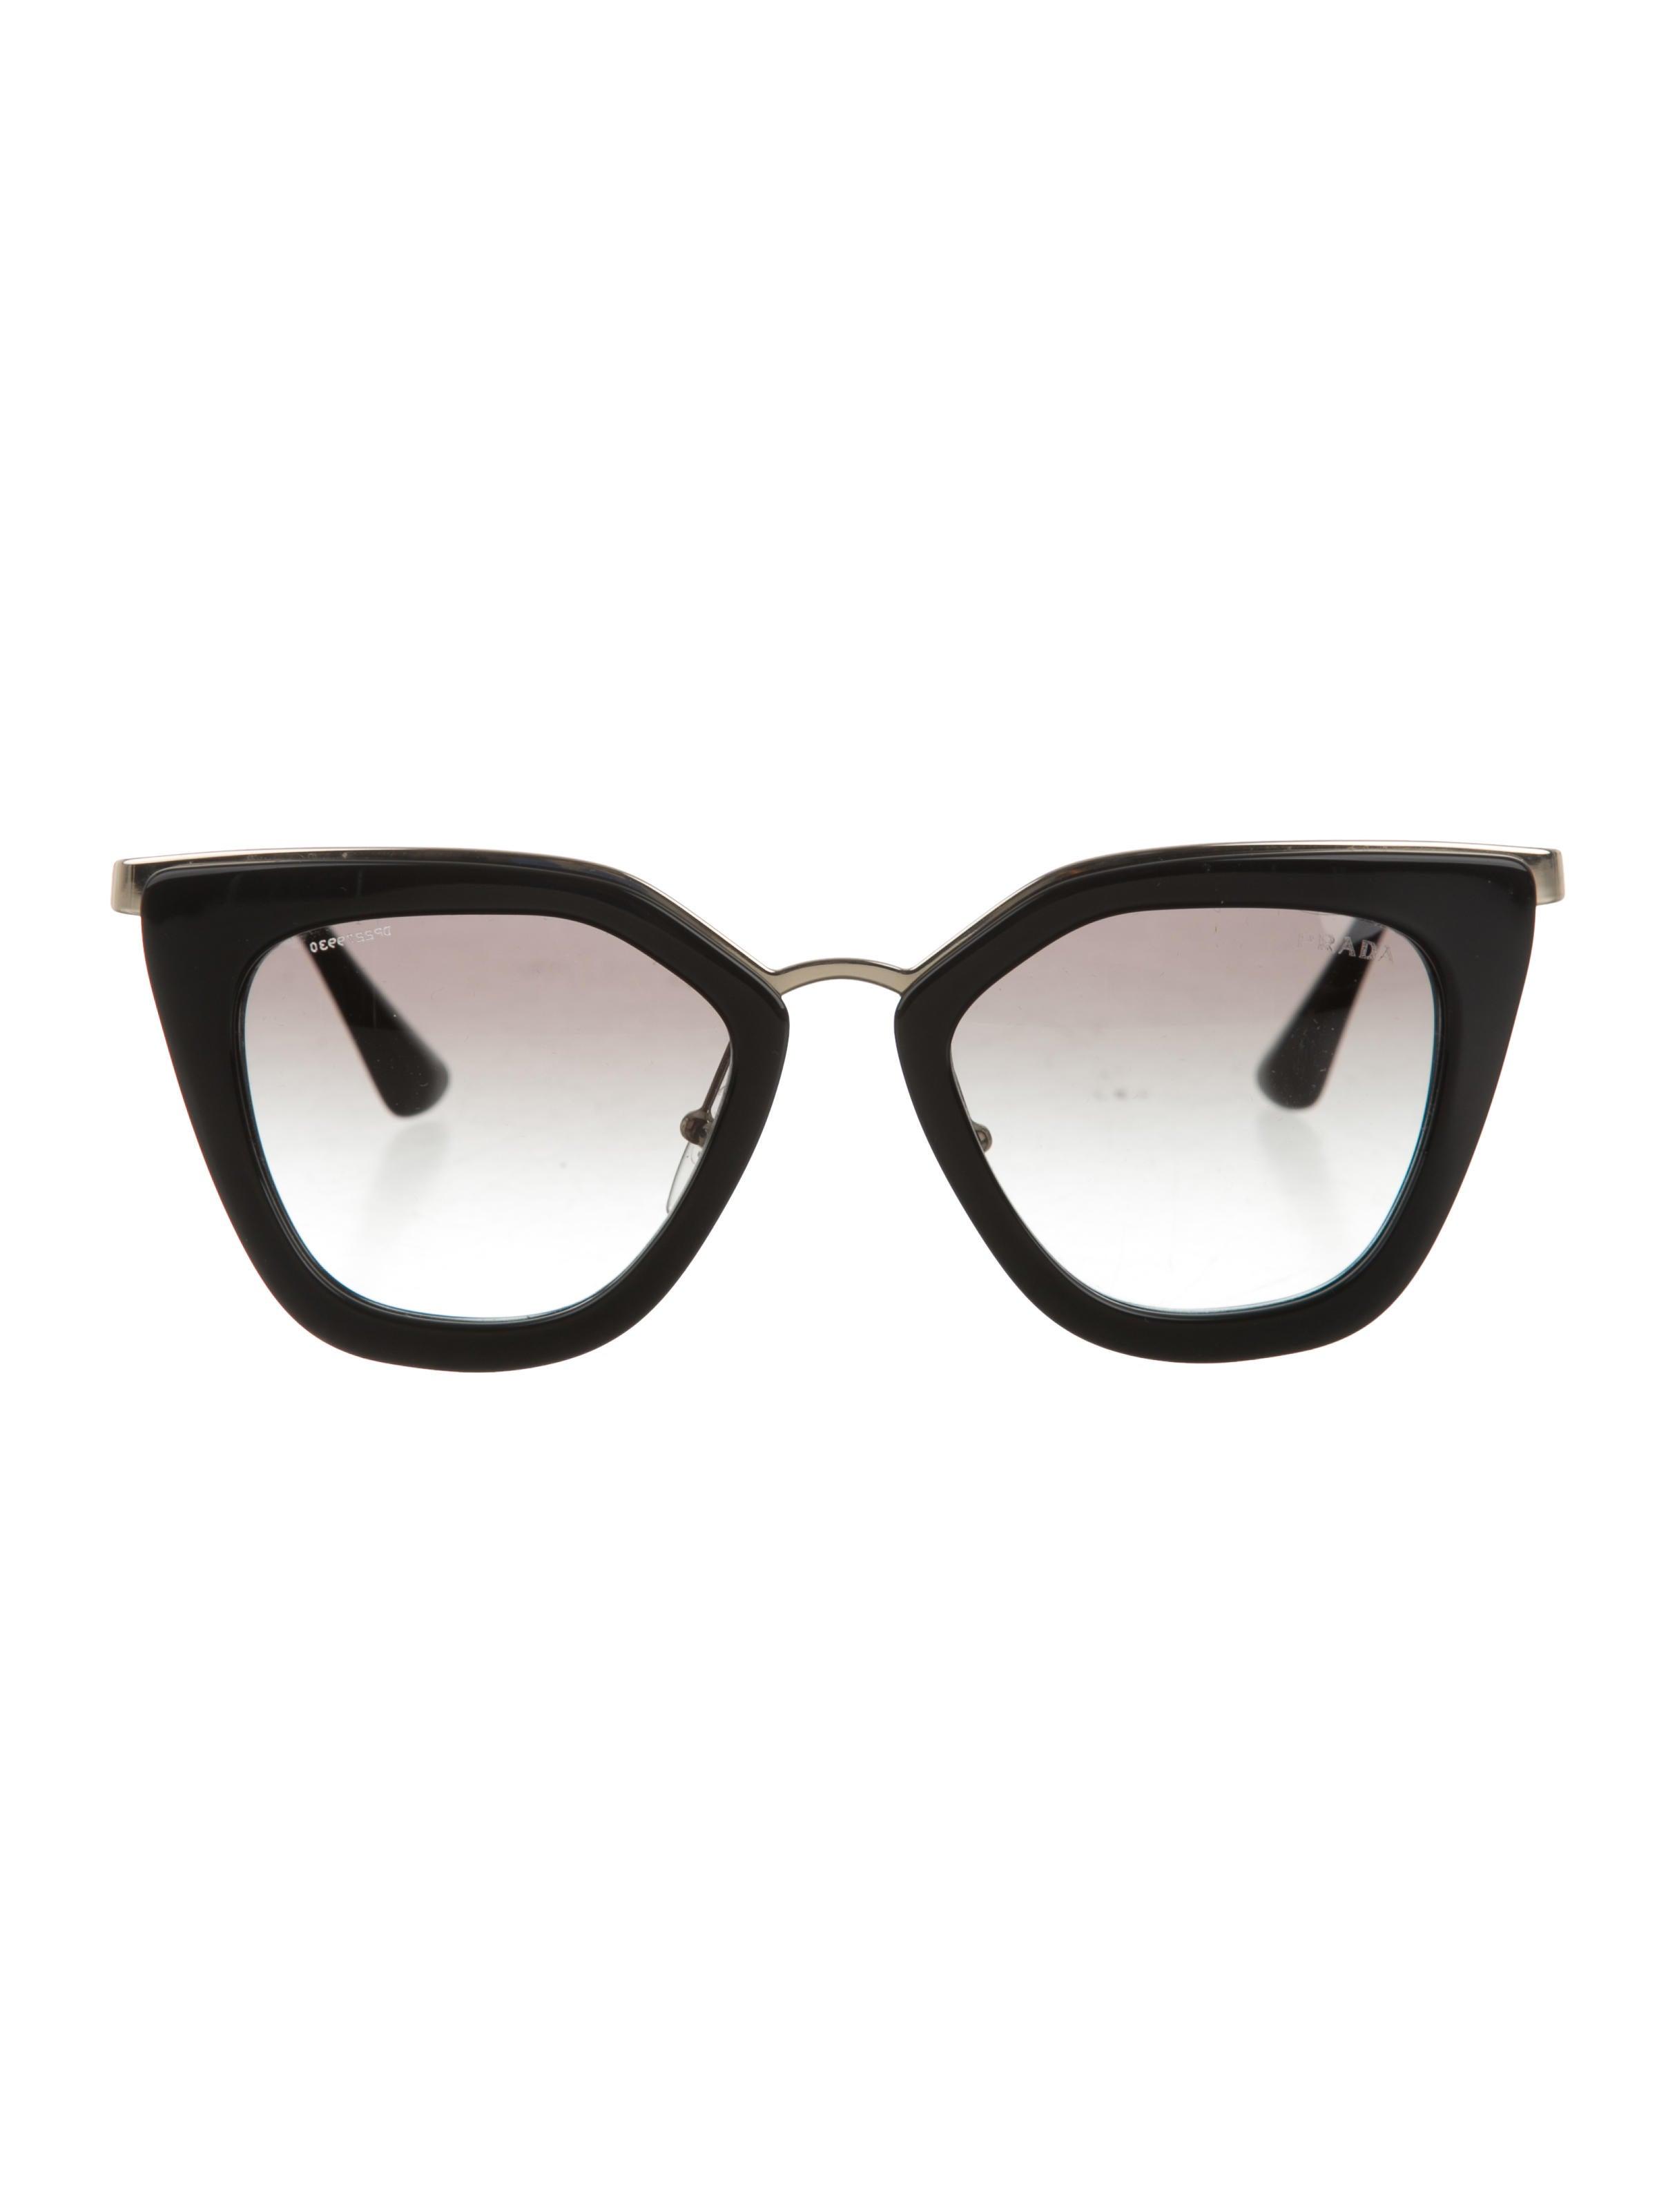 6eeca72794d Prada Gradient Cat-Eye Sunglasses - Accessories - PRA134867